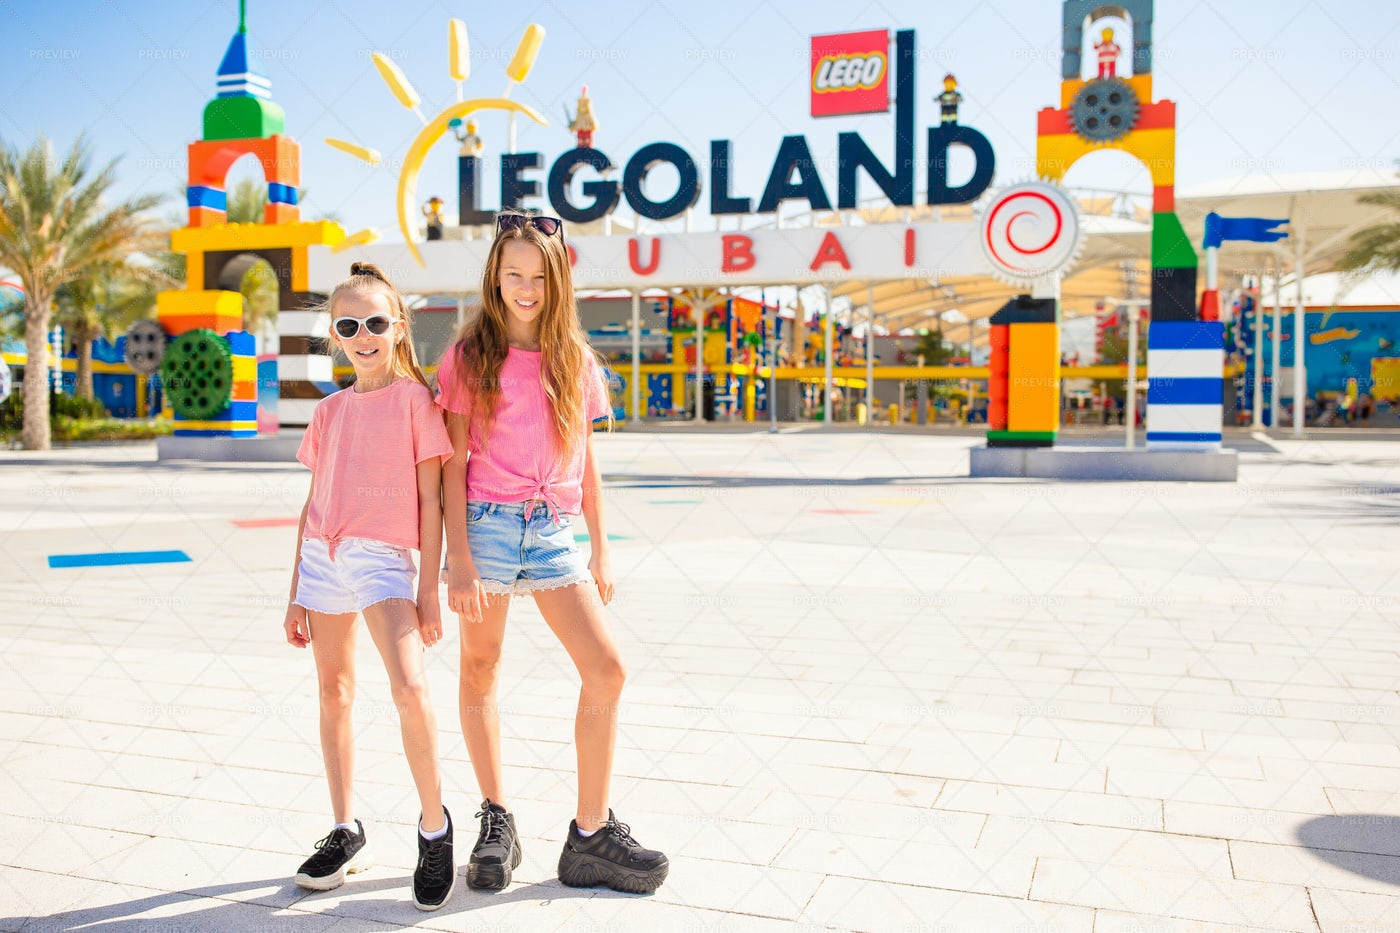 Little Girls In Legoland: Stock Photos